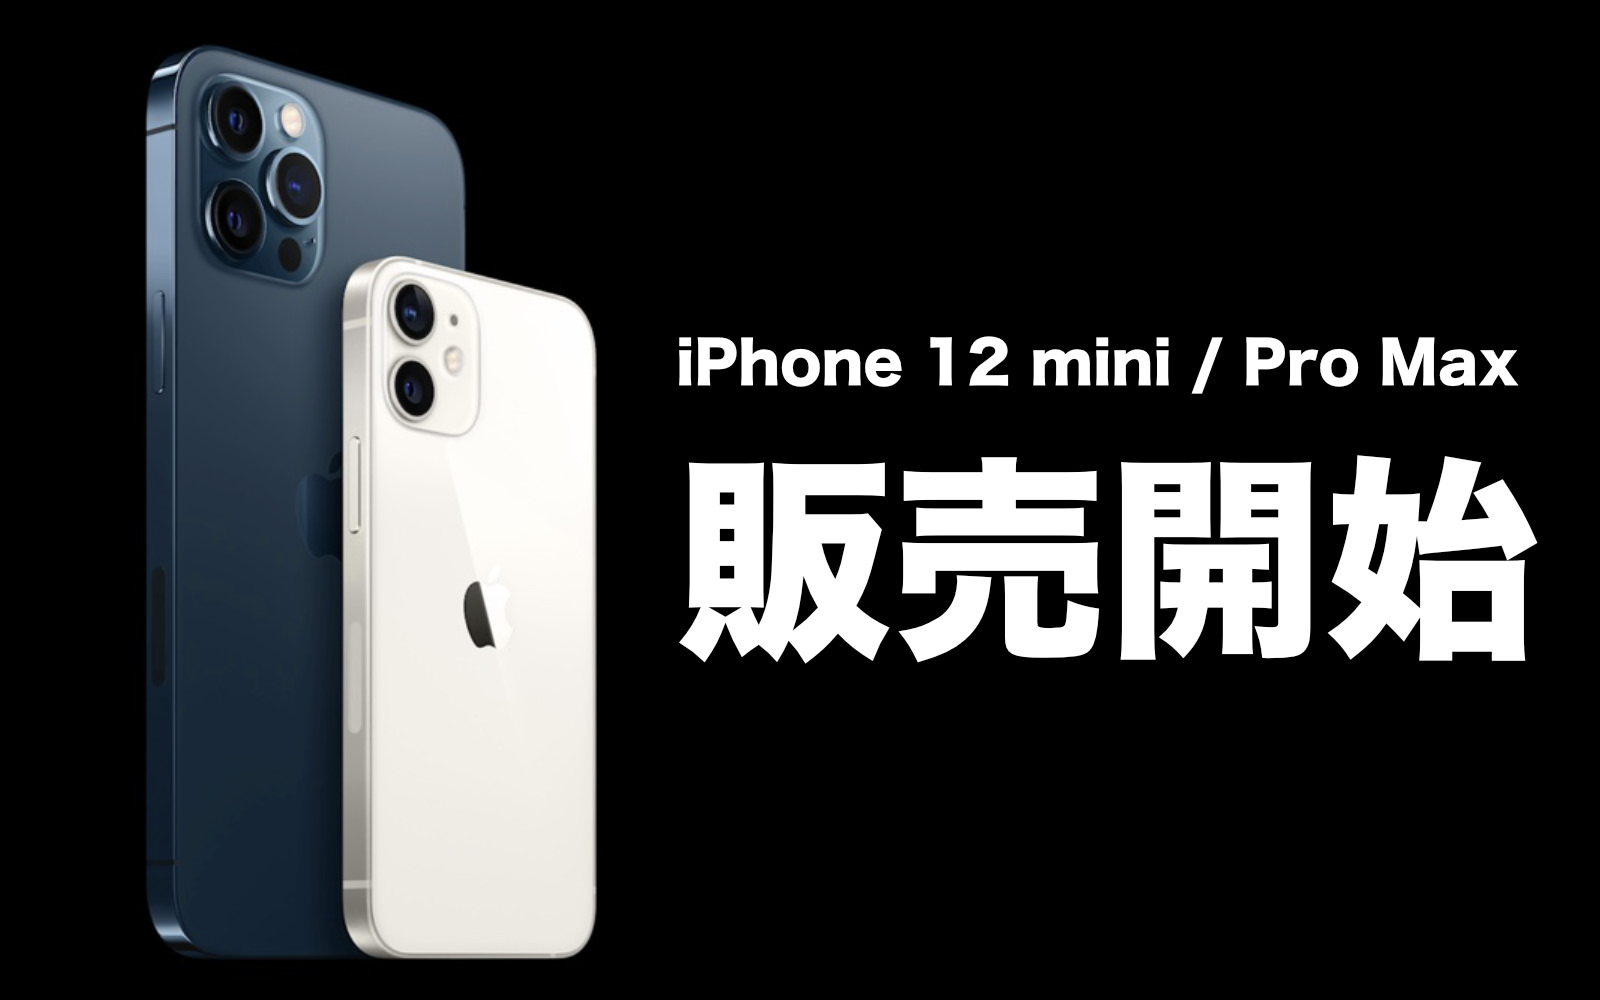 Iphone12mini 12promax on sale